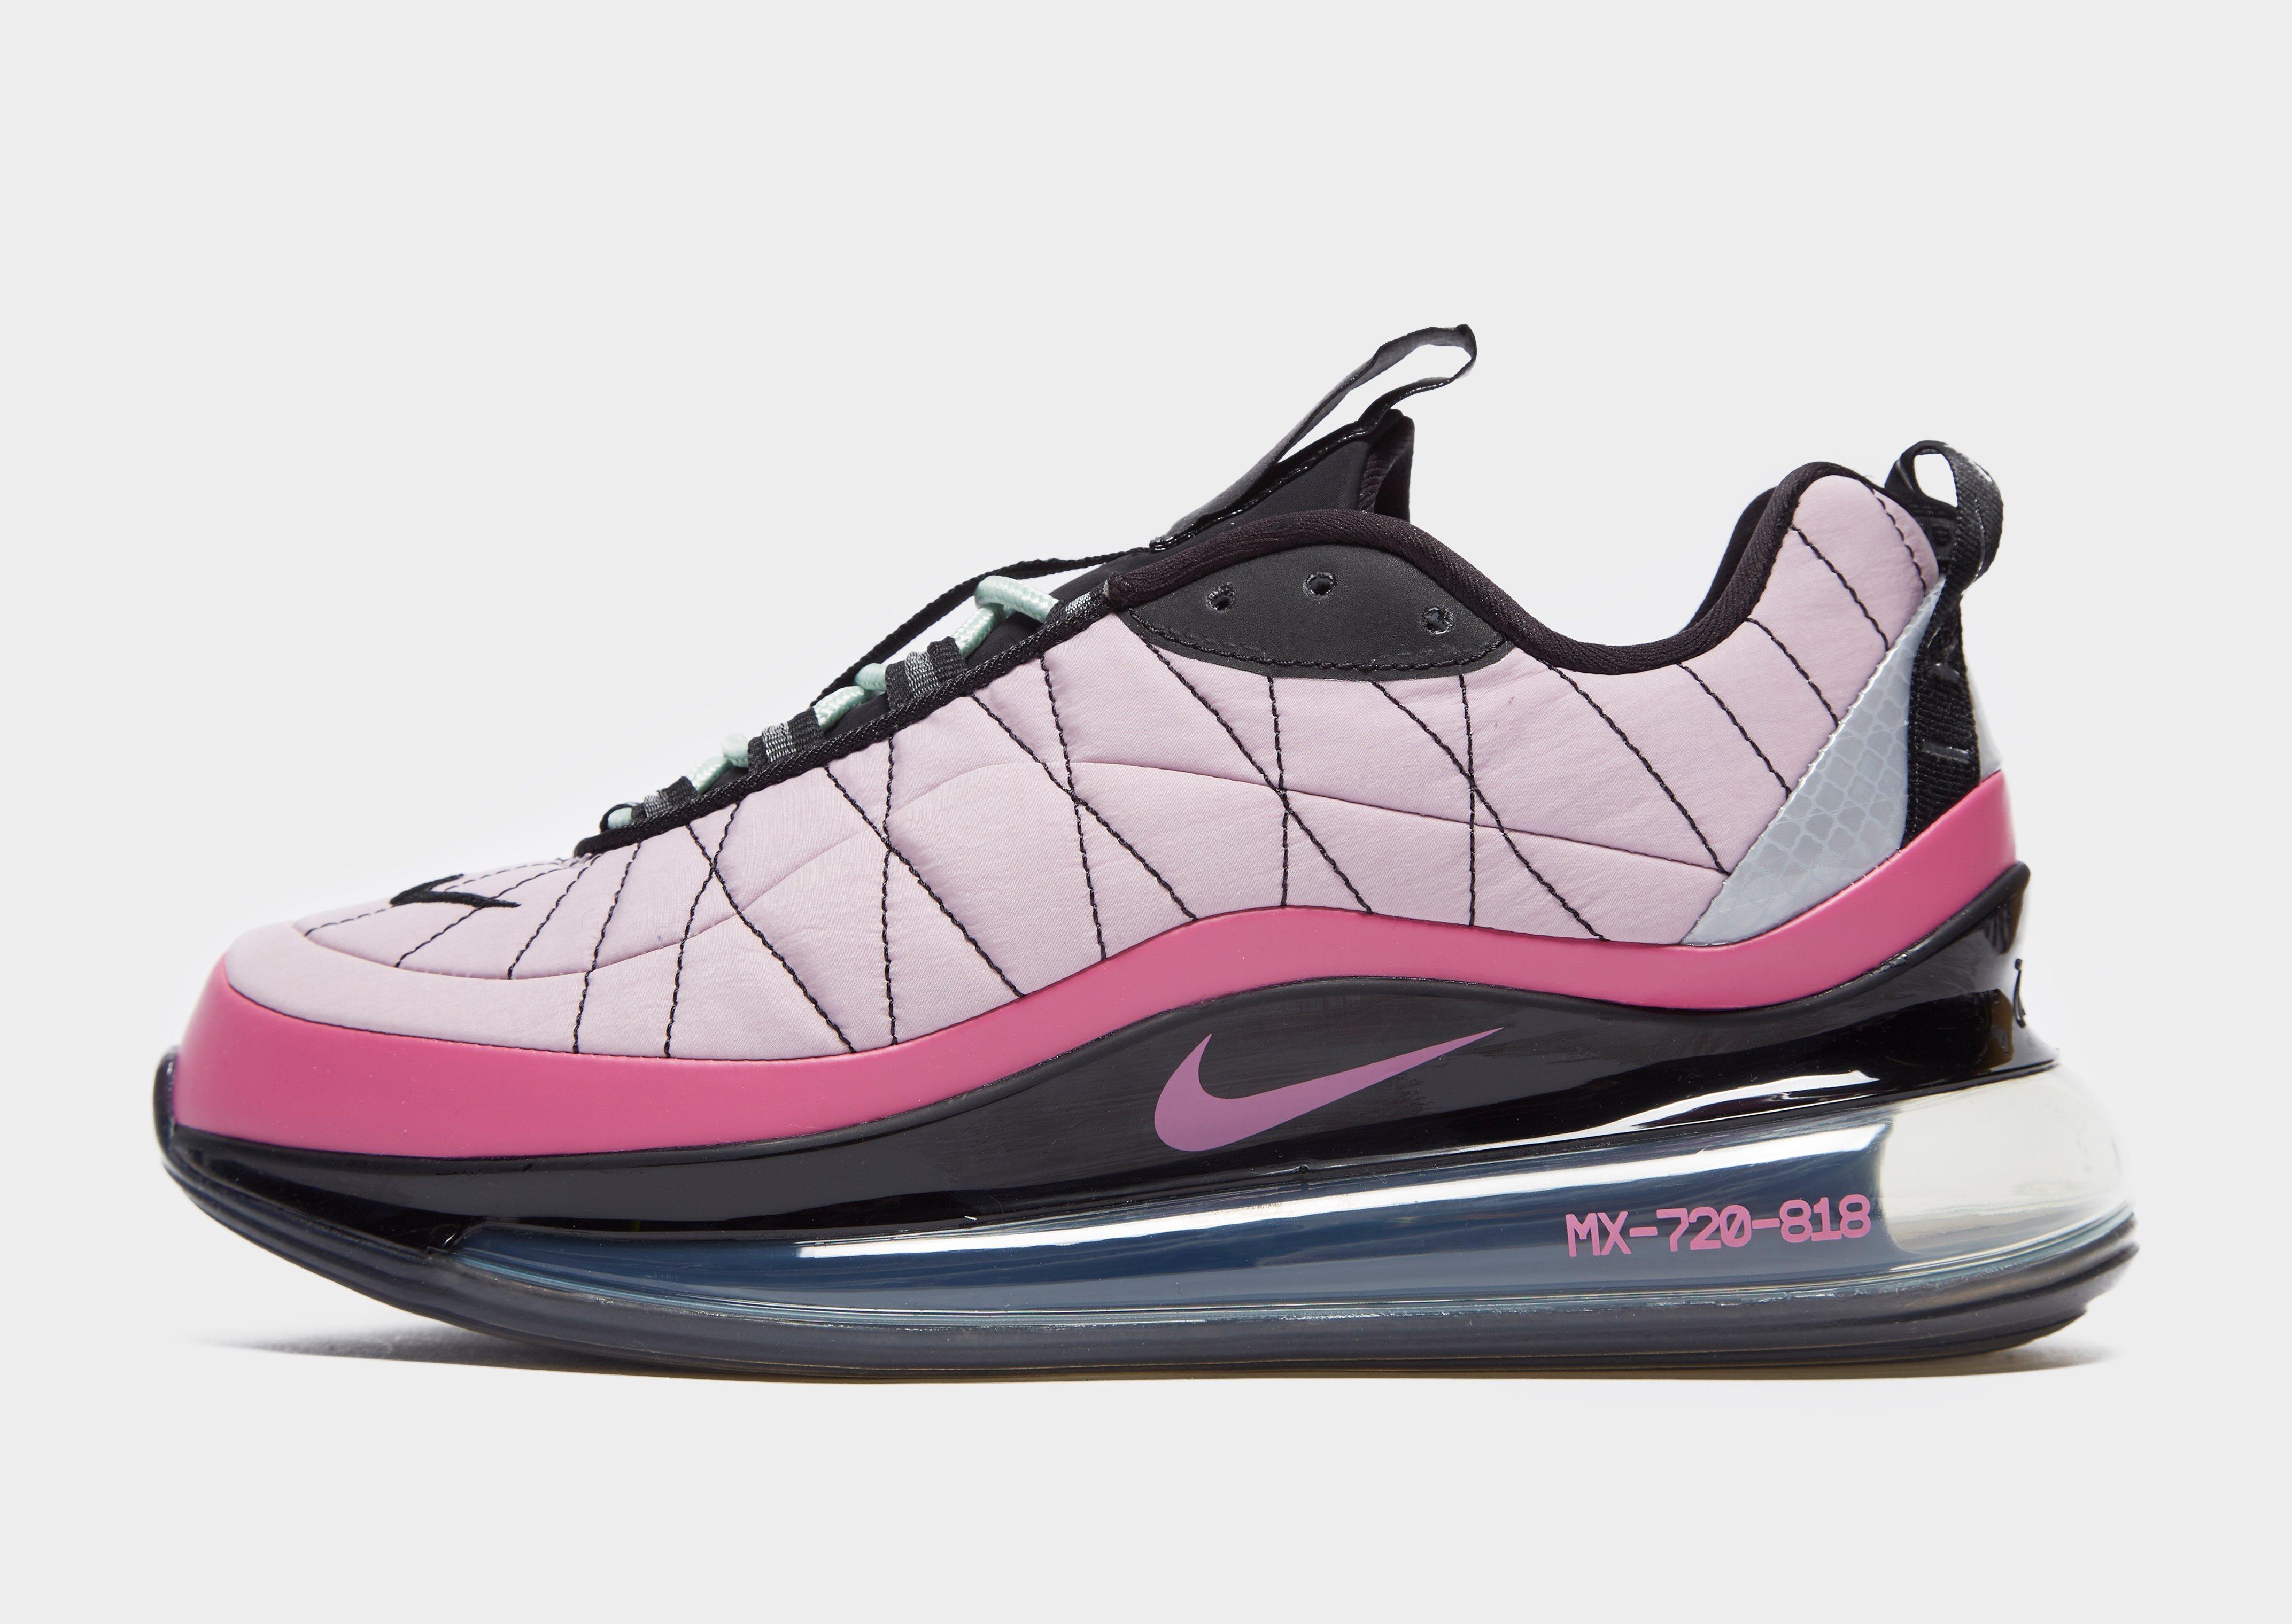 Nike MAX 720 818 para Mulher | JD Sports